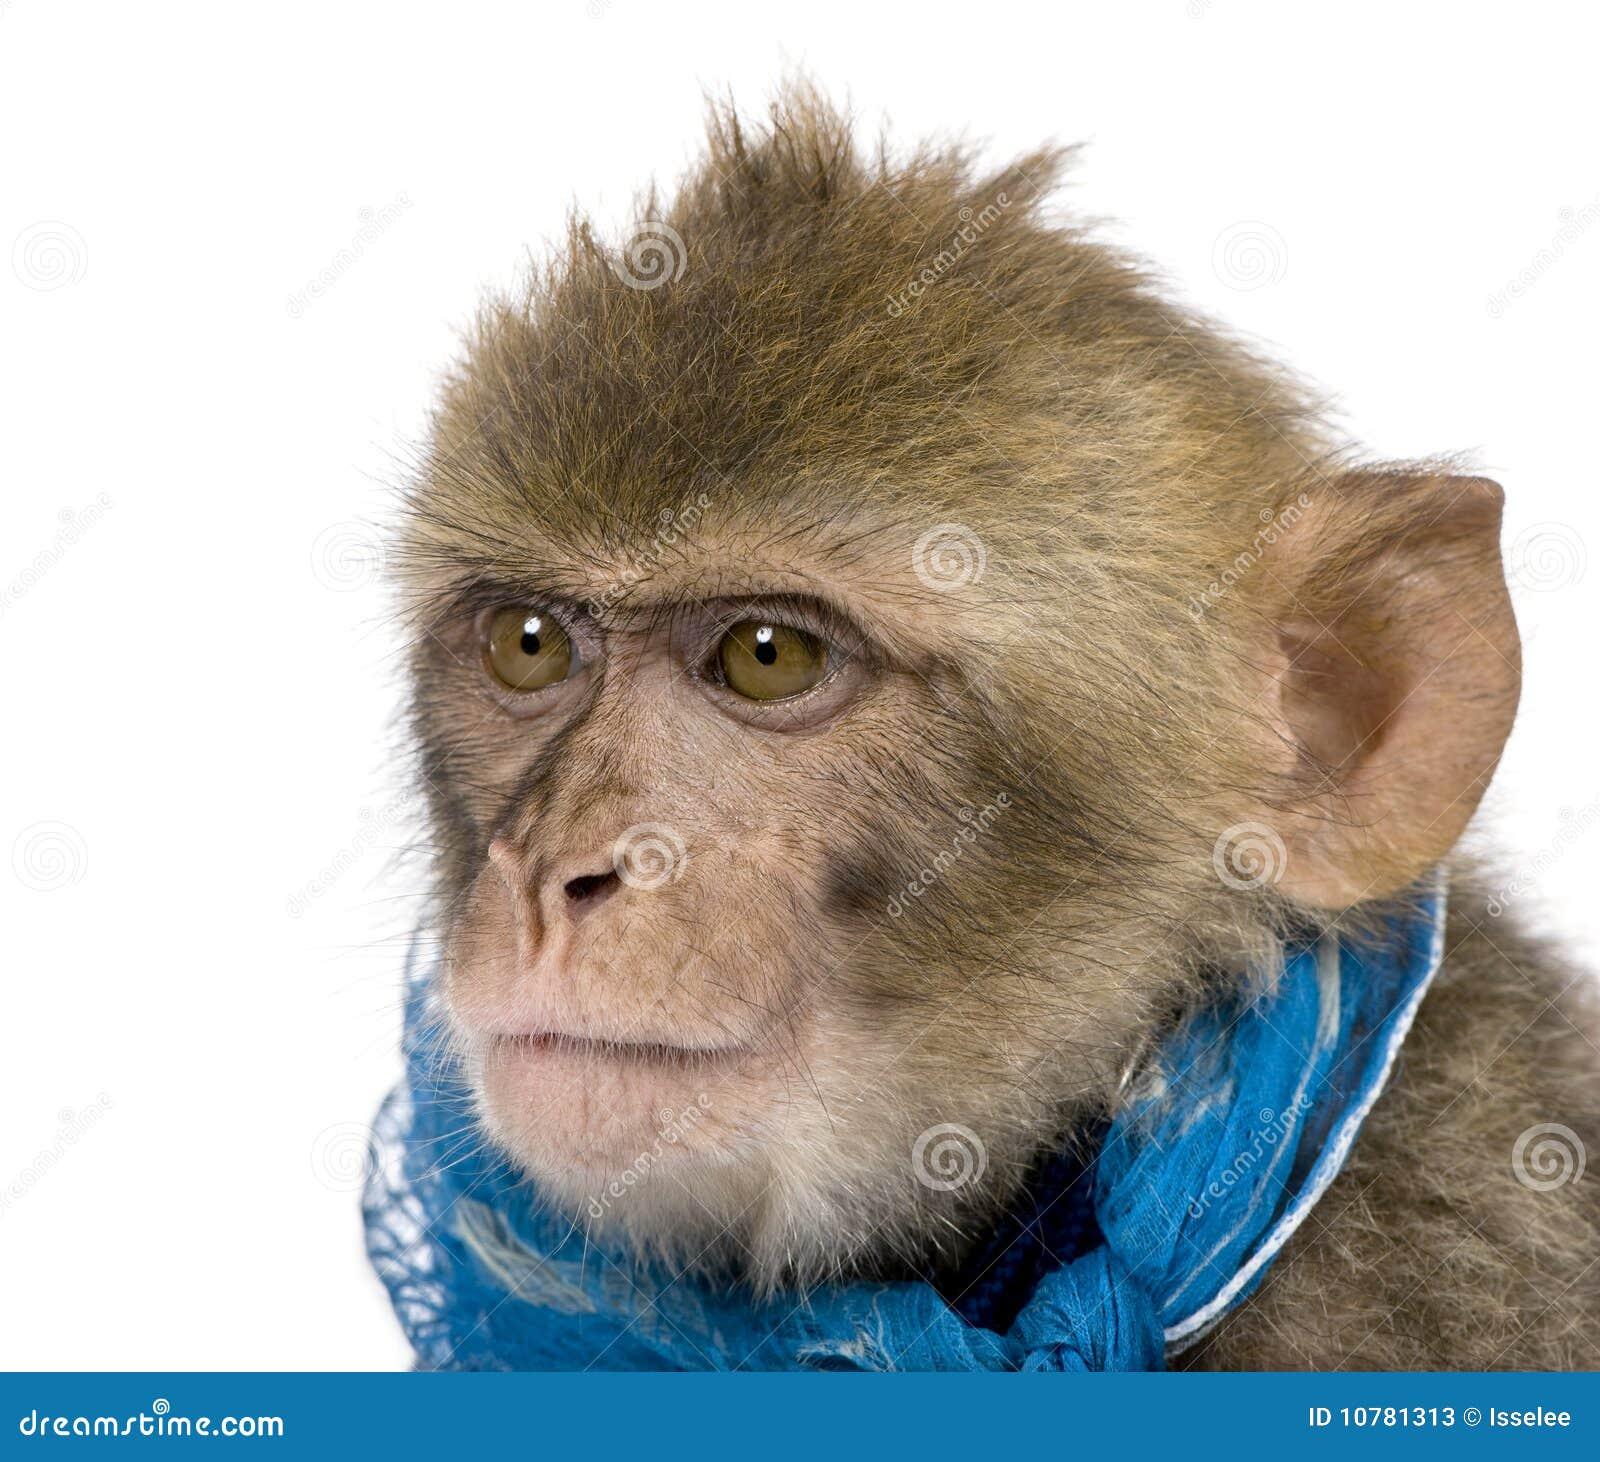 Jong Barbarije Macaque, Macaca Sylvanus, 1 éénjarige